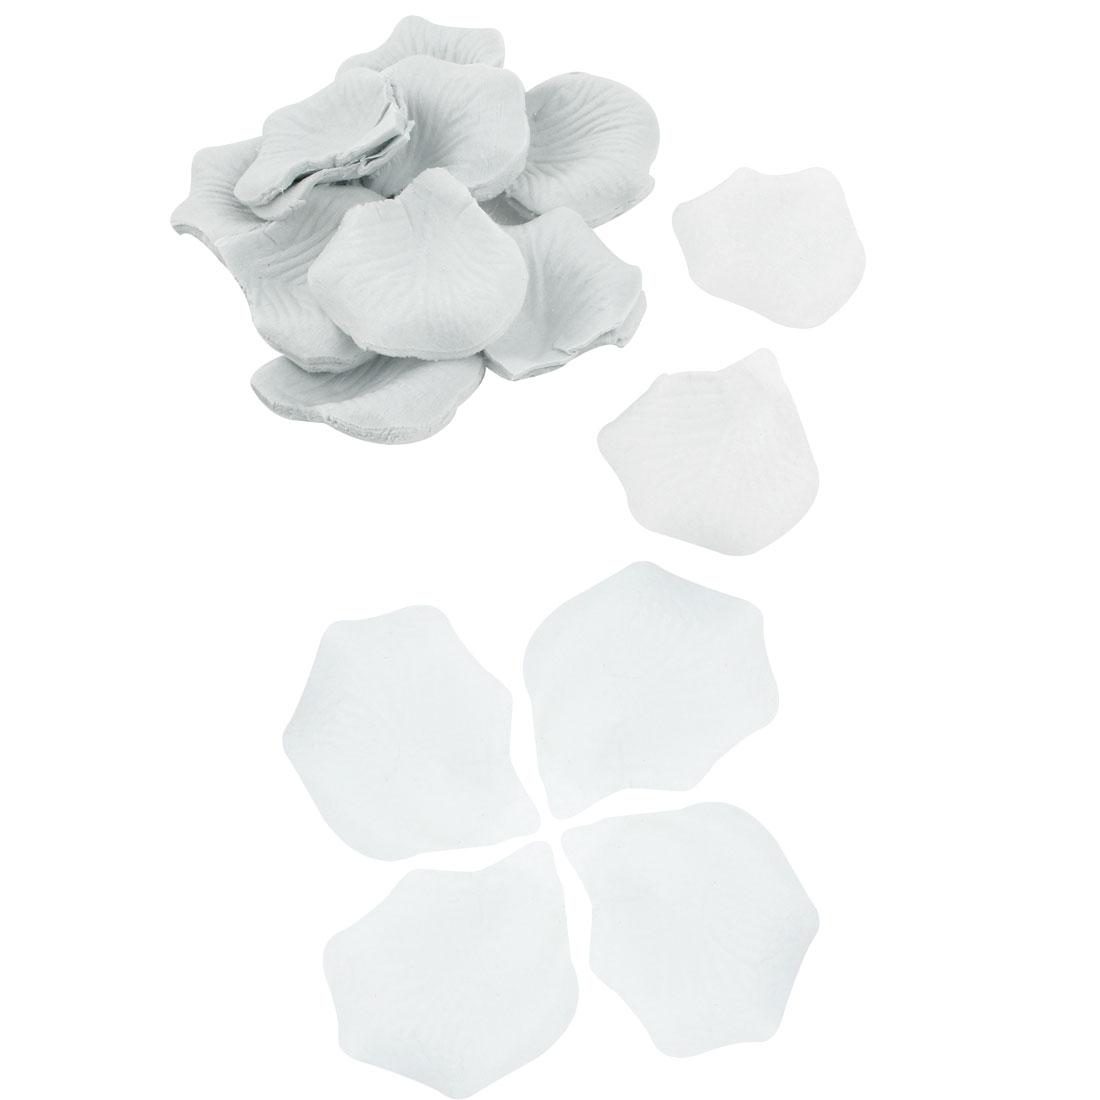 200 Pcs Wedding Festival House Accent Artificial Fabric Rose Petals White